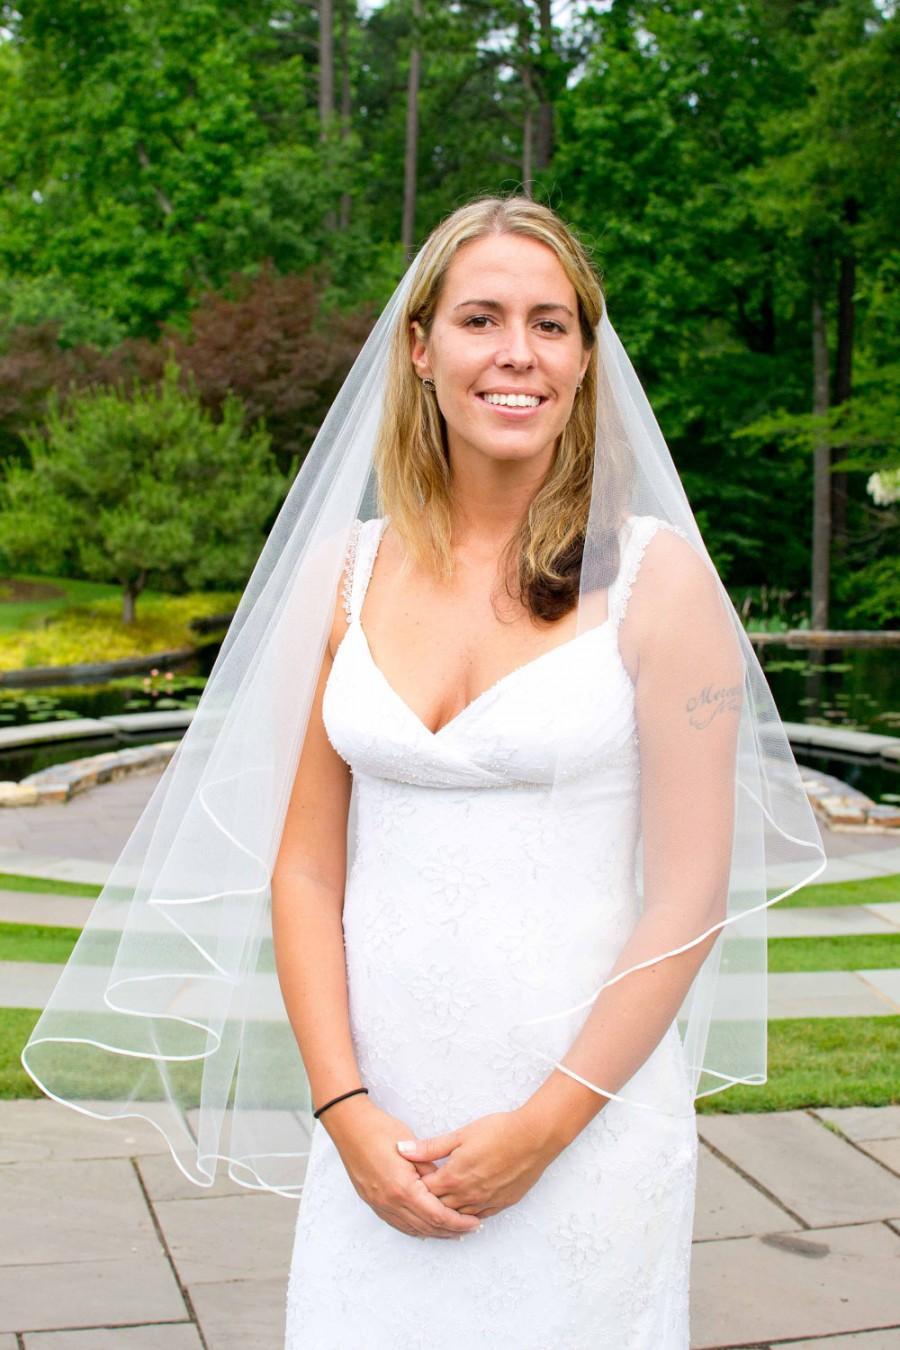 Wedding - Wedding veil - 20 x 40 circular cut drop bridal veil with satin ribbon trim